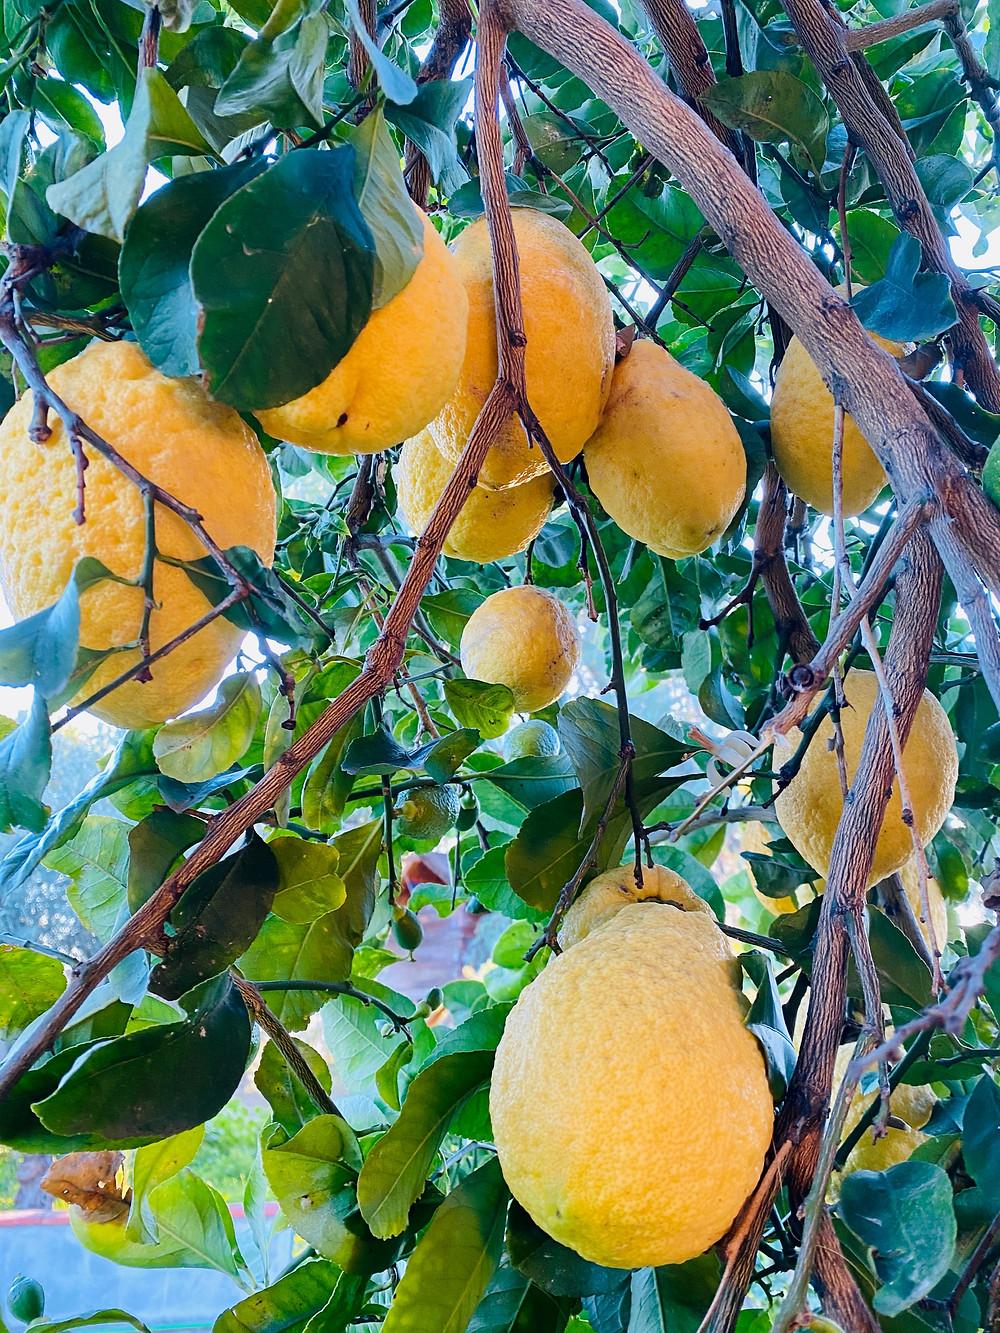 sicily-products-lemons